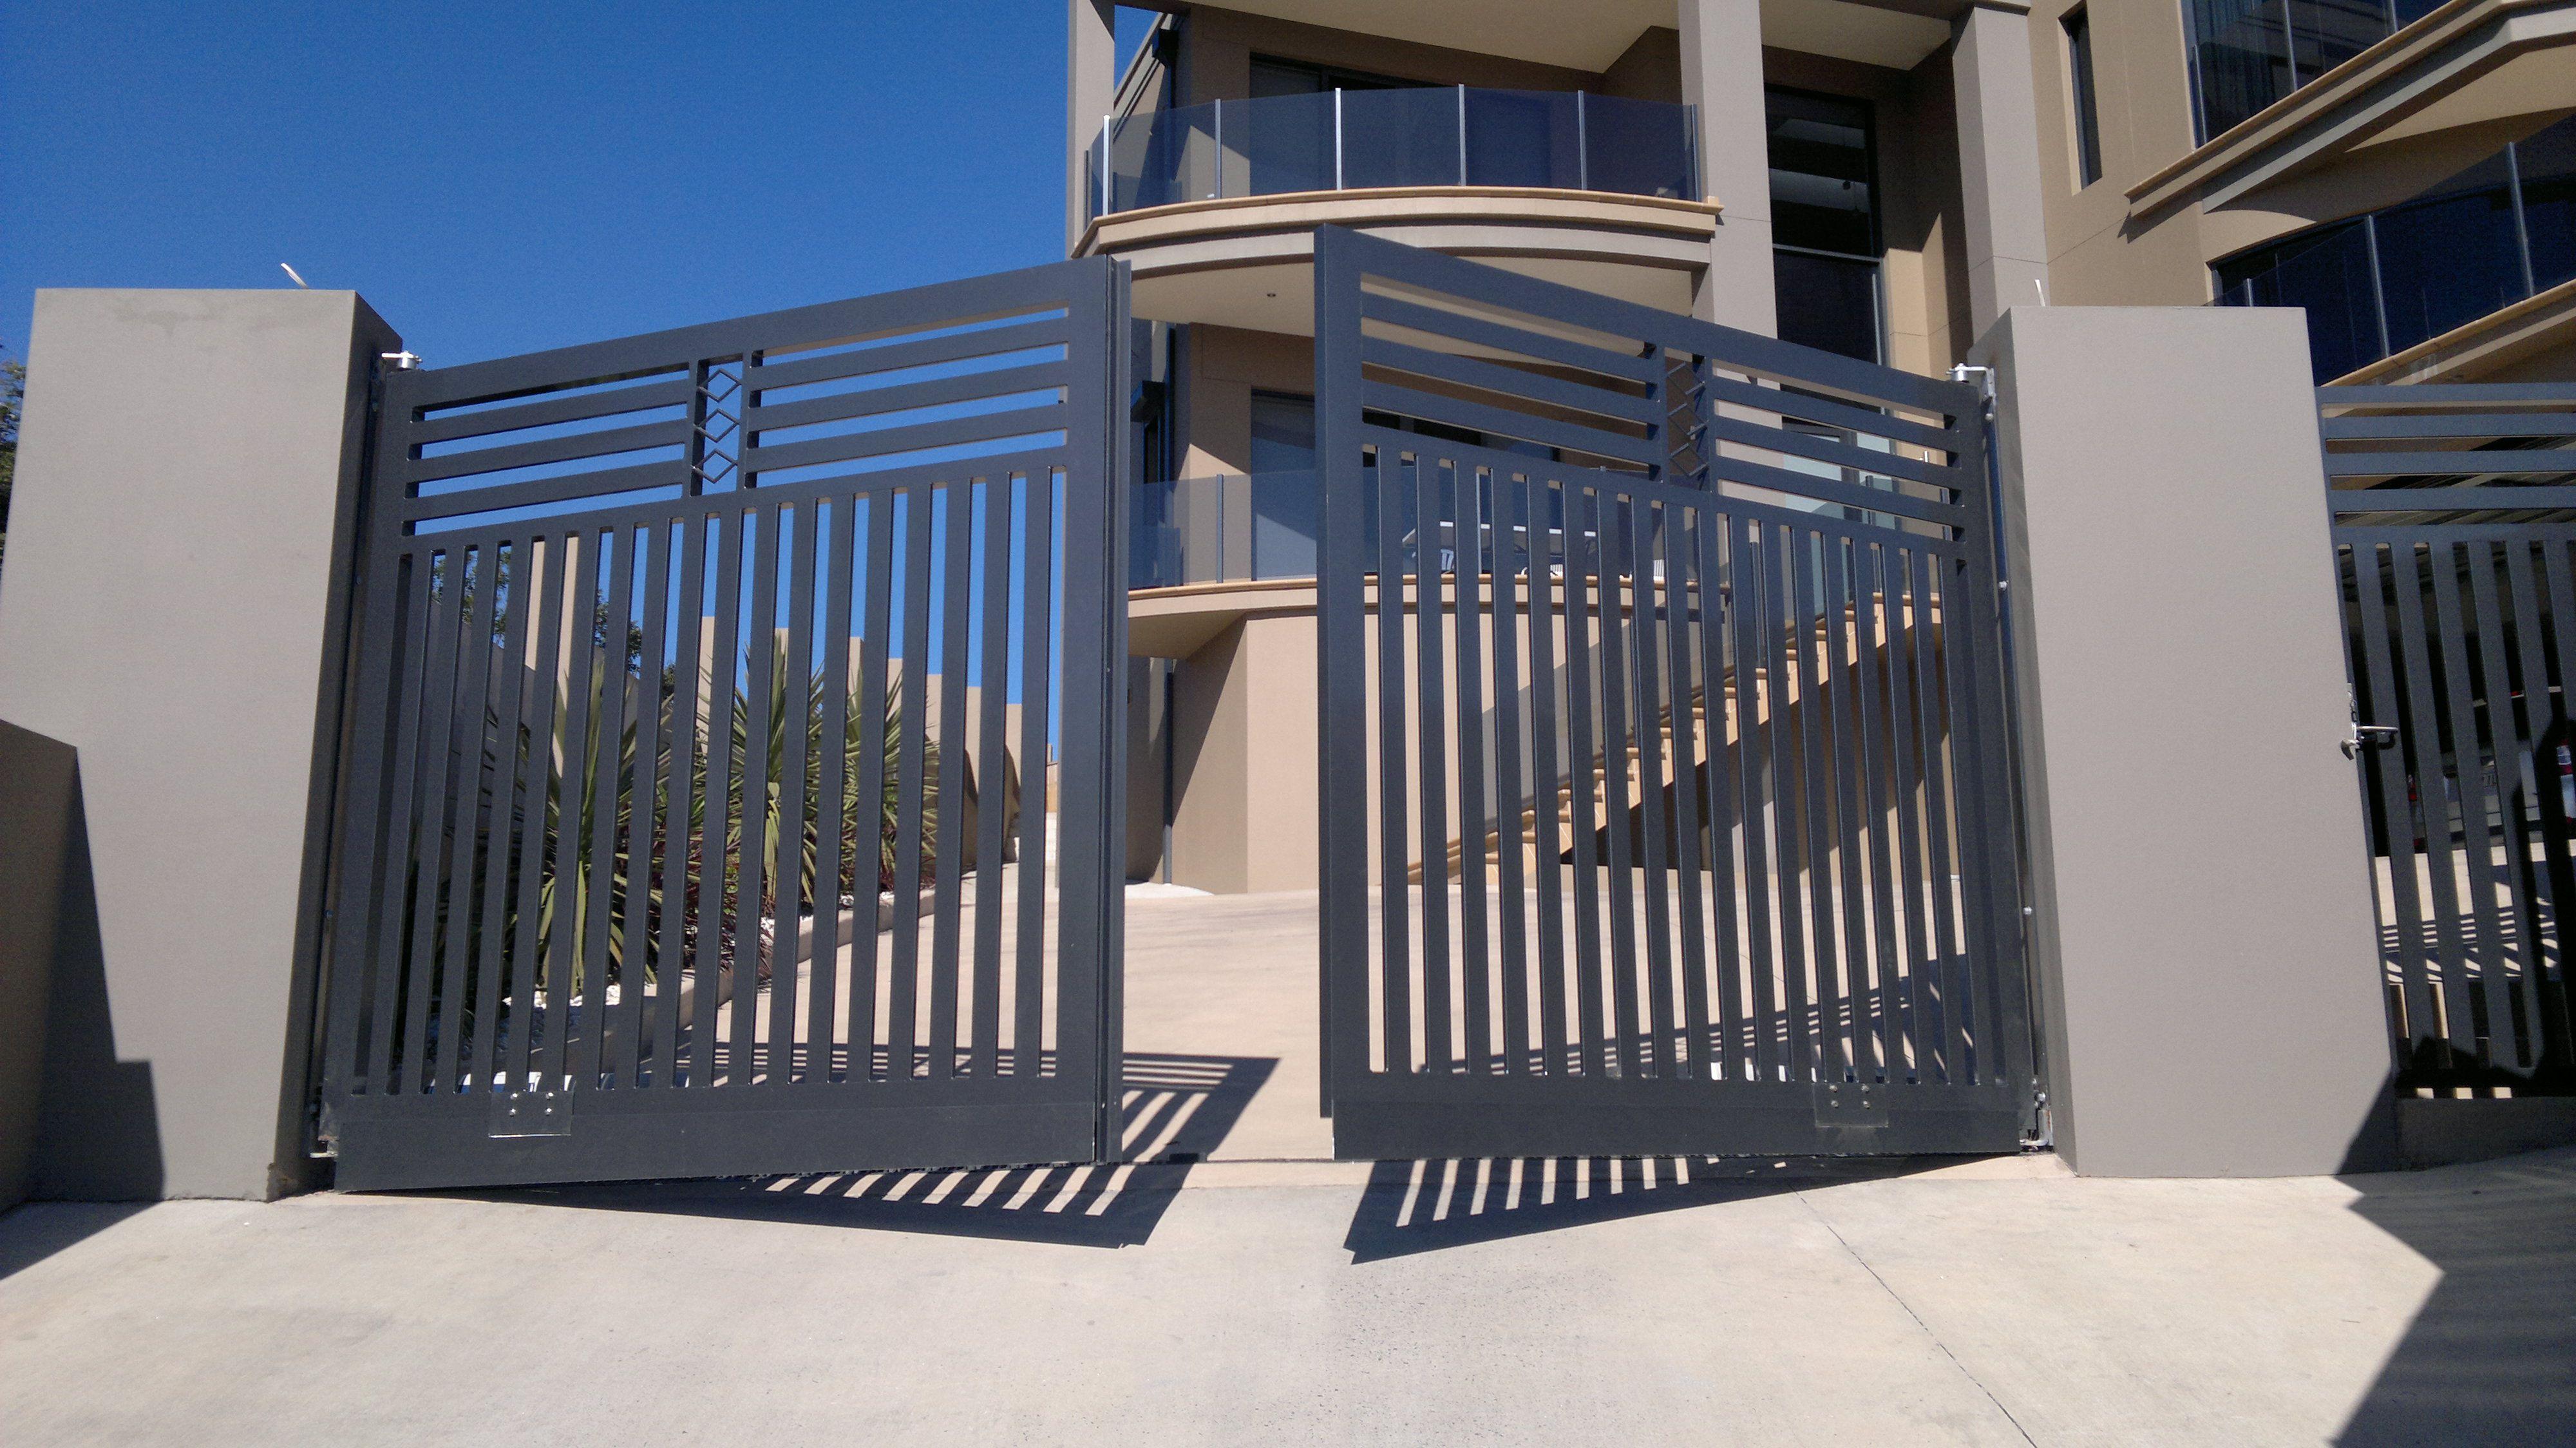 No 7 - M/C design | Gates | Pinterest | Gates, Modern contemporary ... for Contemporary Modern Gate Designs  183qdu